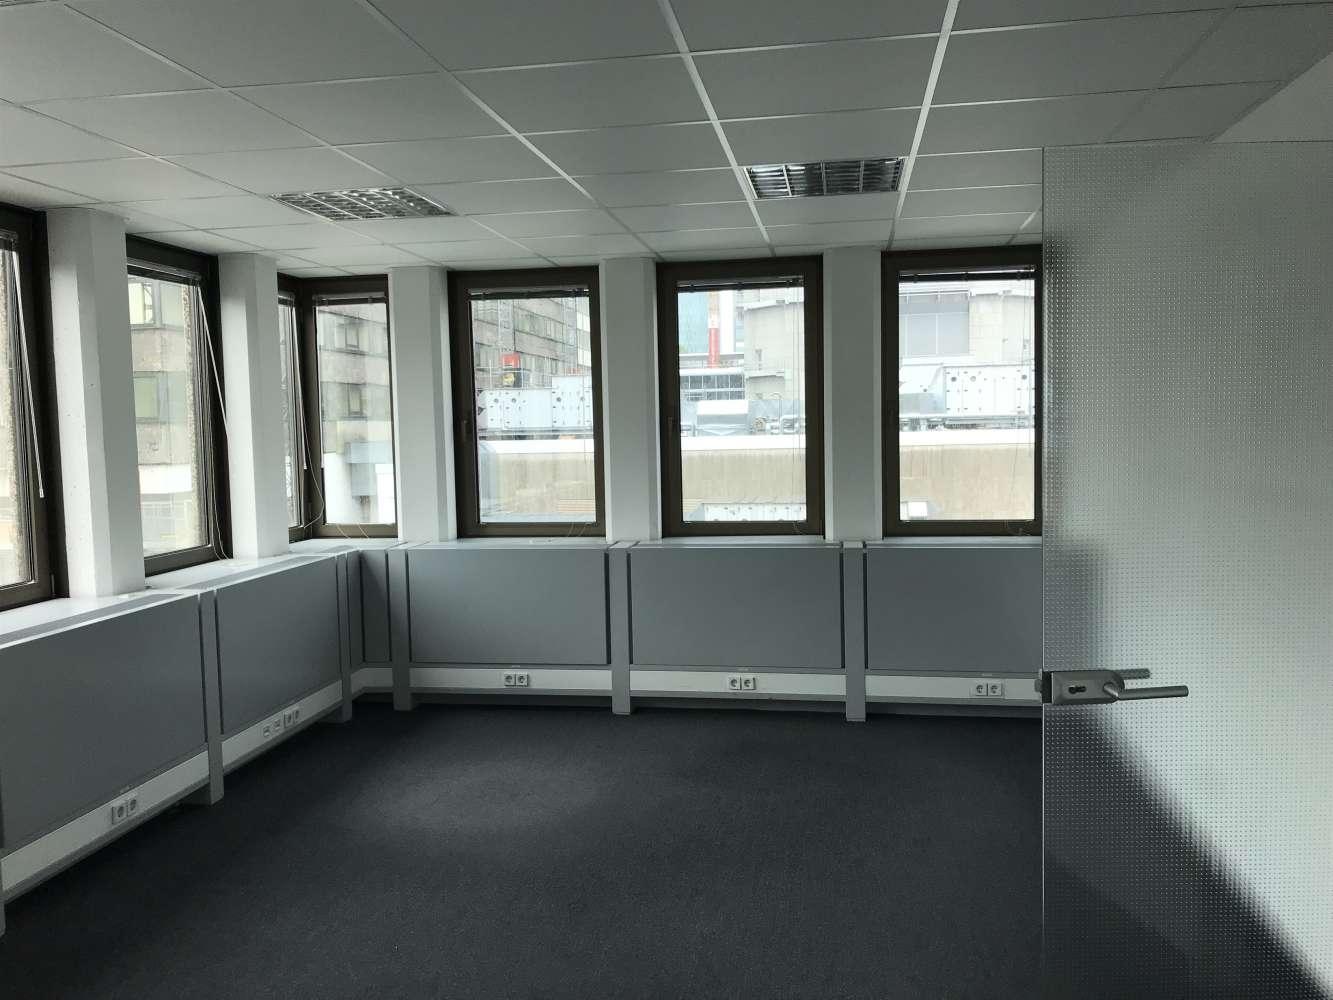 Büros Frankfurt am main, 60329 - Büro - Frankfurt am Main, Bahnhofsviertel - F0038 - 10496791